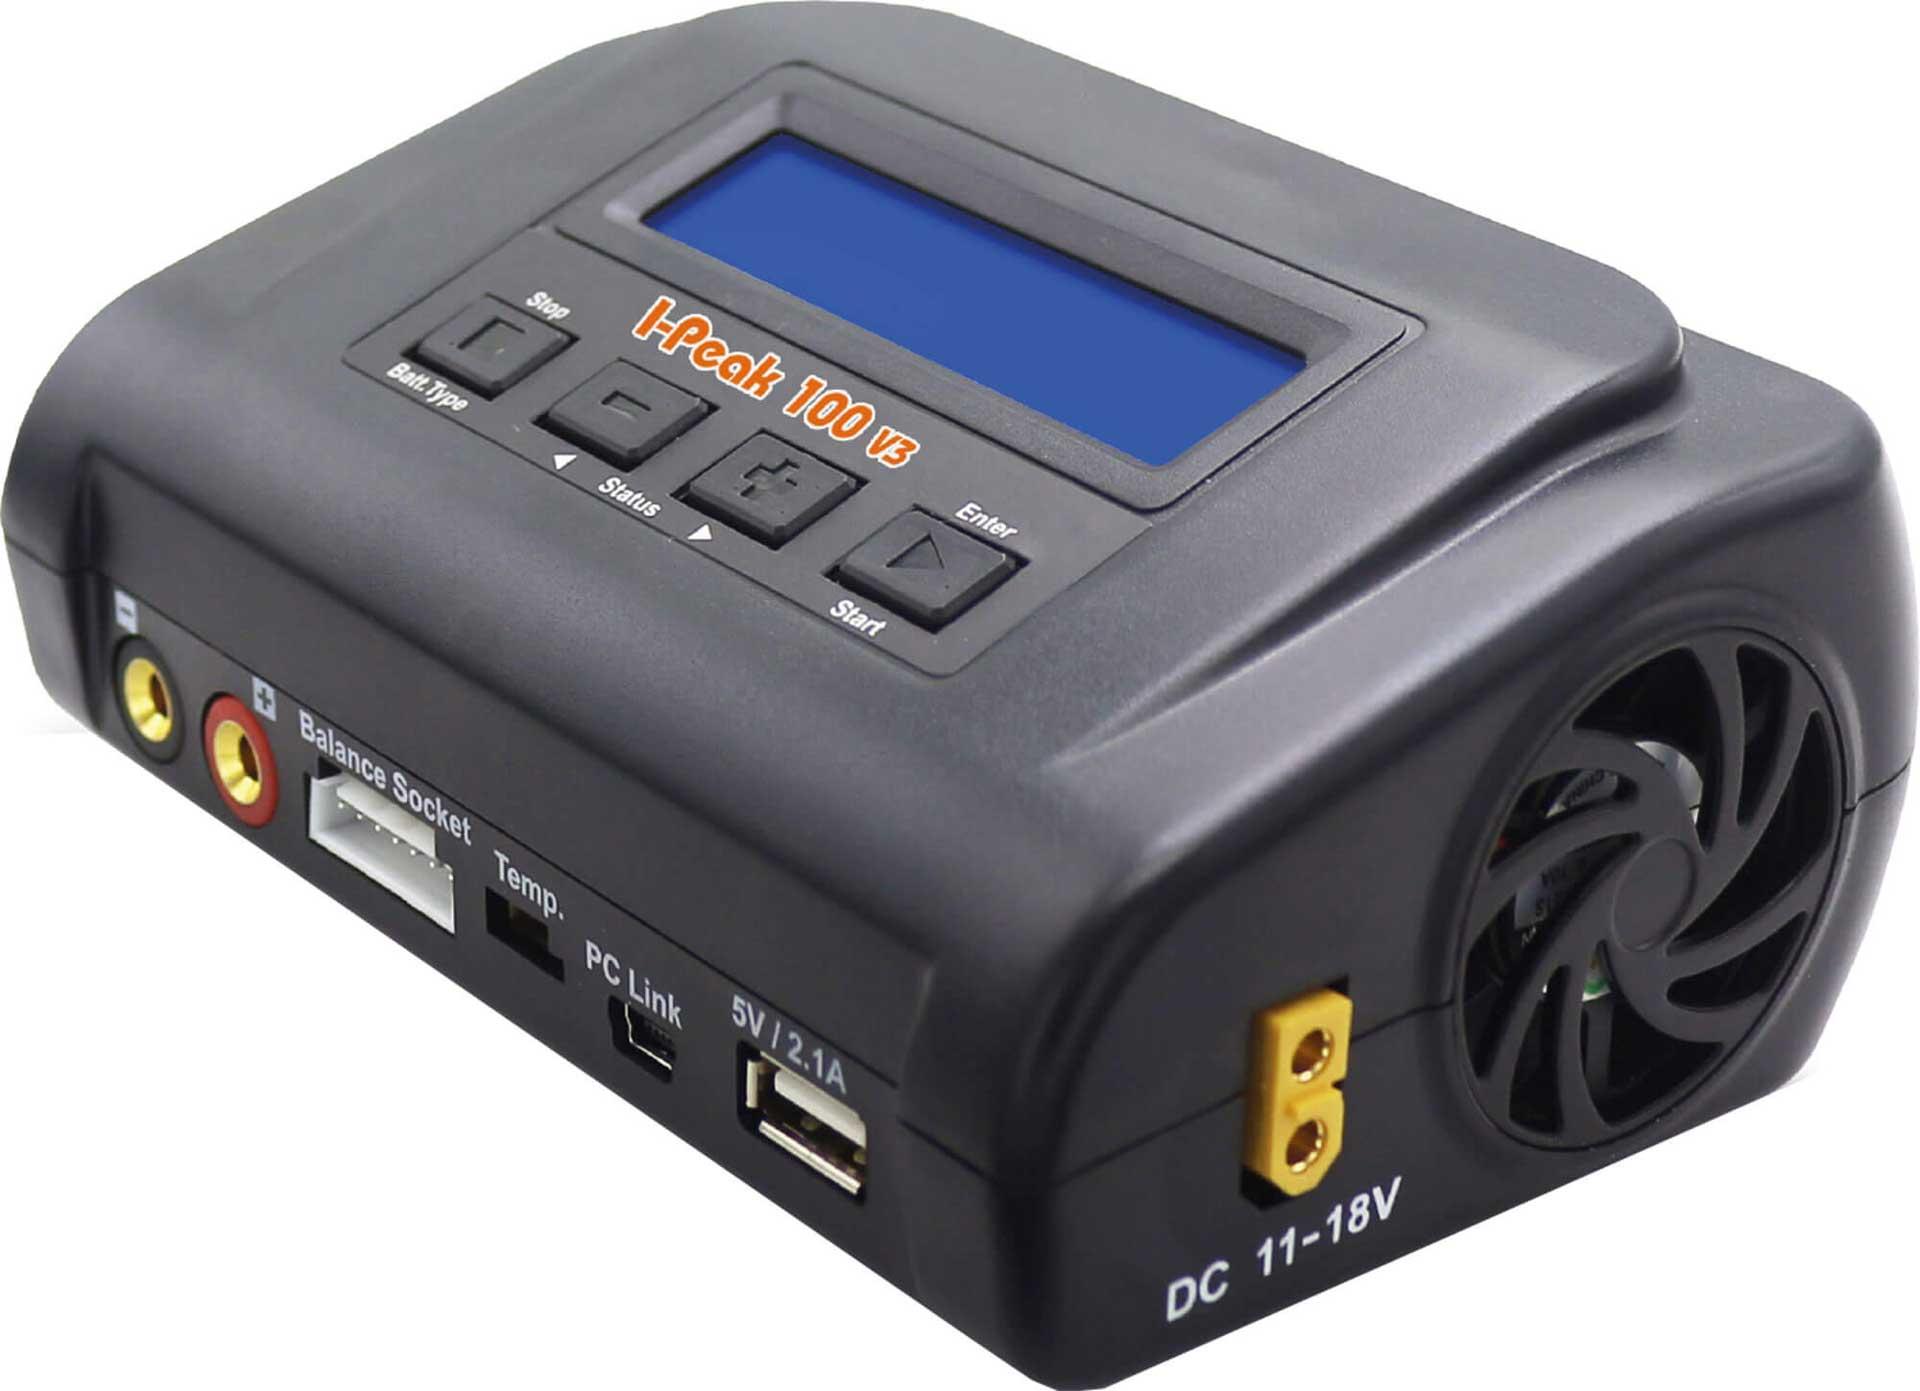 DRIVE & FLY MODELS I-PEAK 100 V3 AC/DC LADEGERÄT